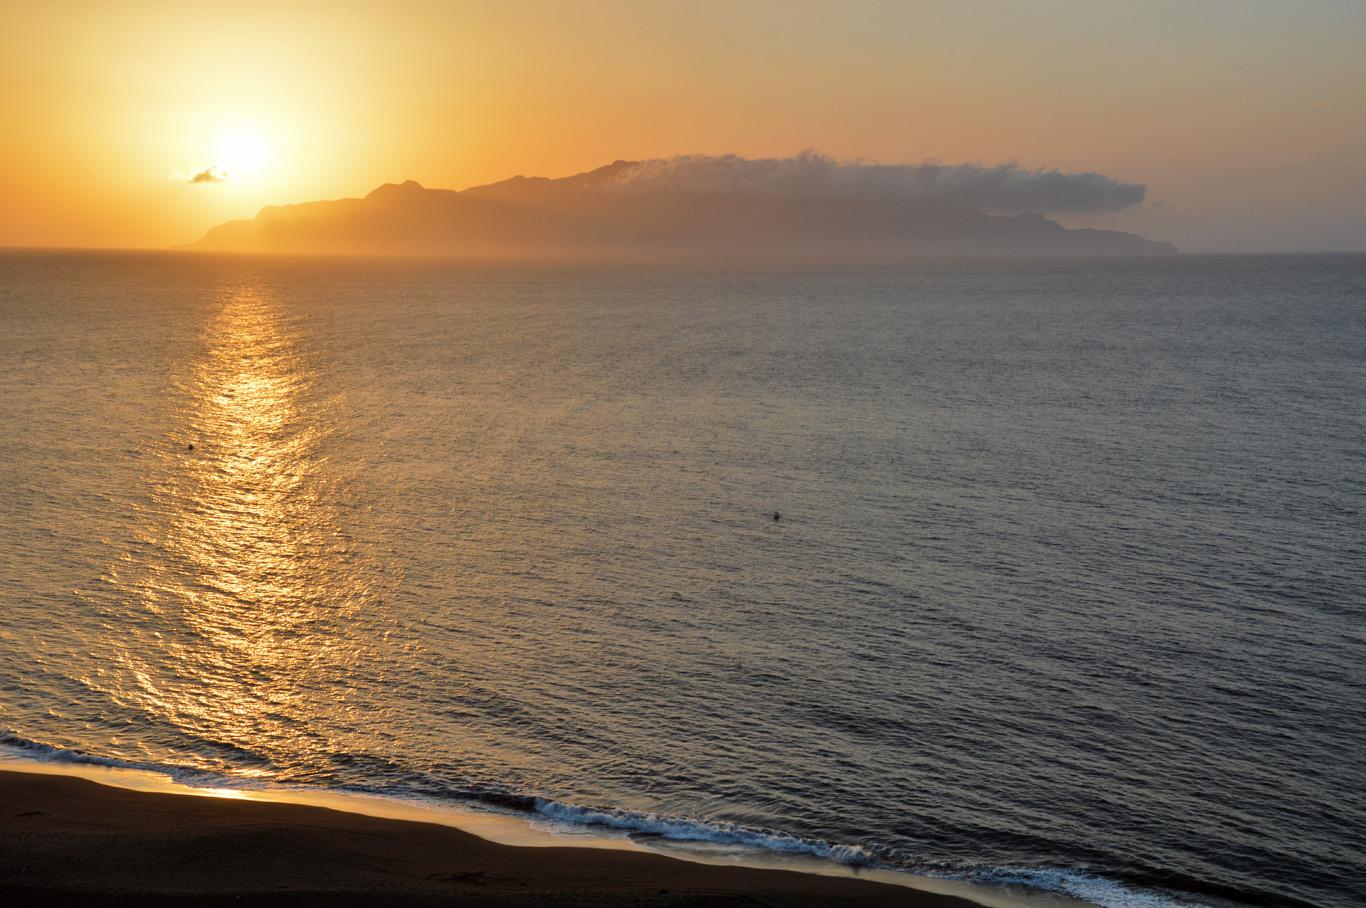 Sunset seen from Sao Filipe -  Brava  in the background